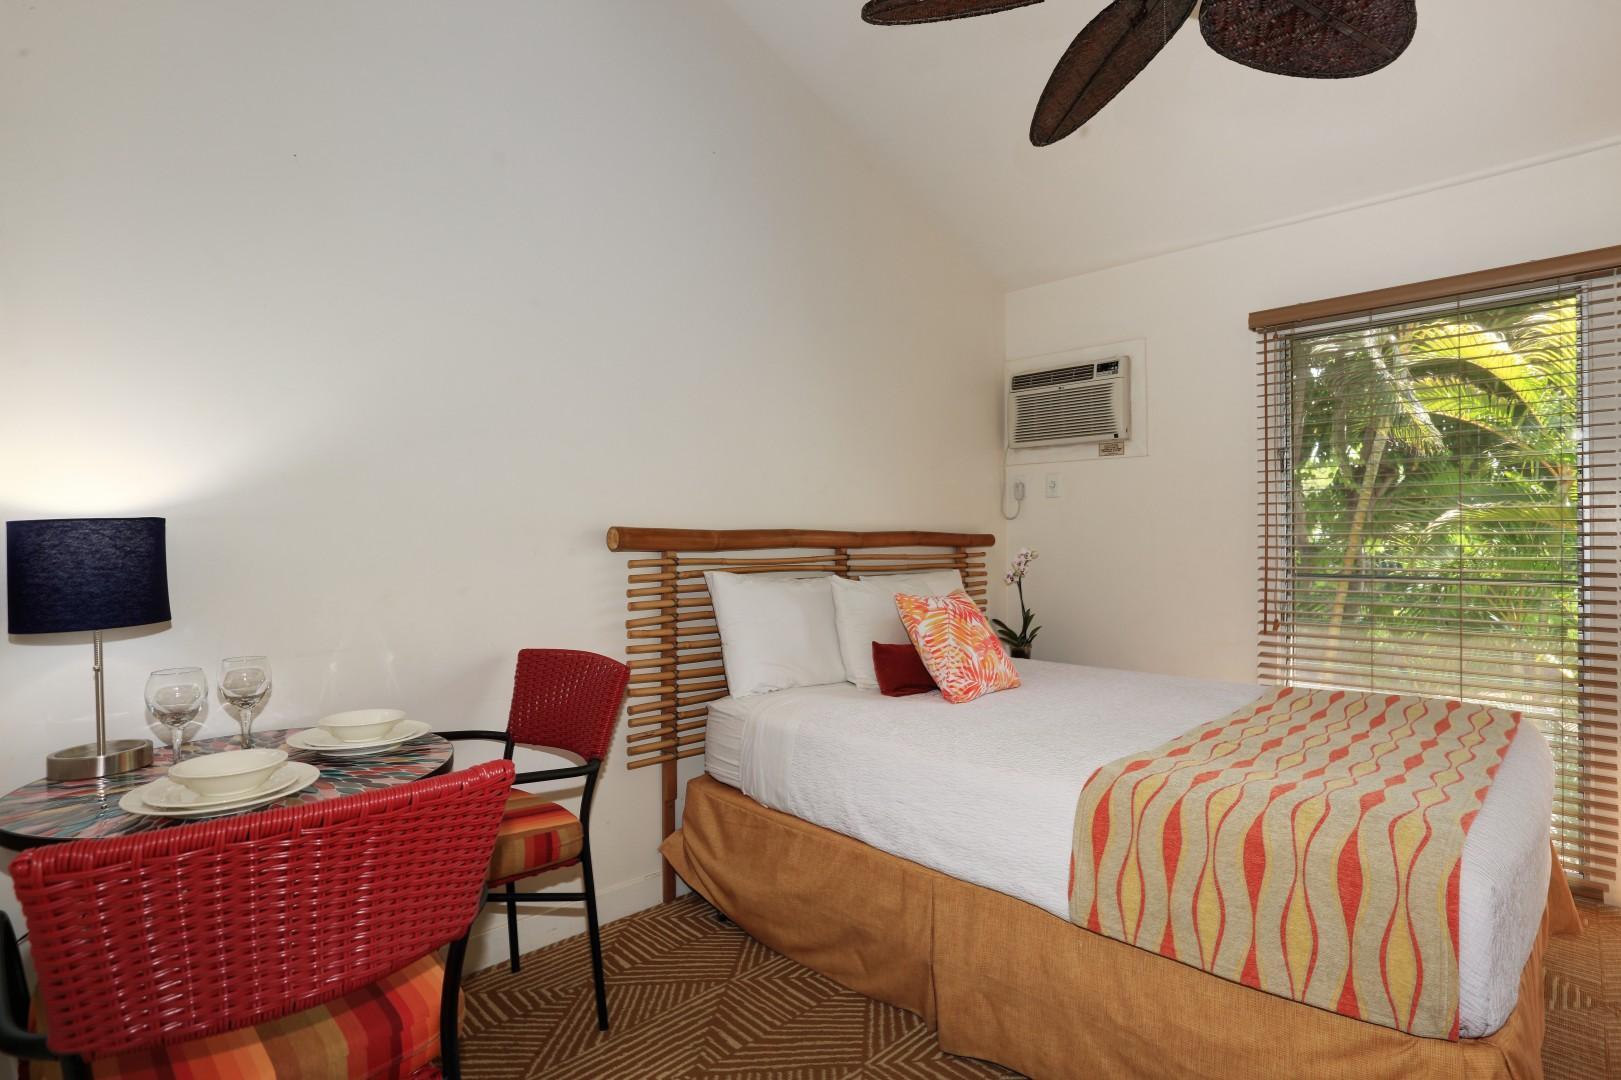 Clean, comfortable and classic Hawaiiana vibe